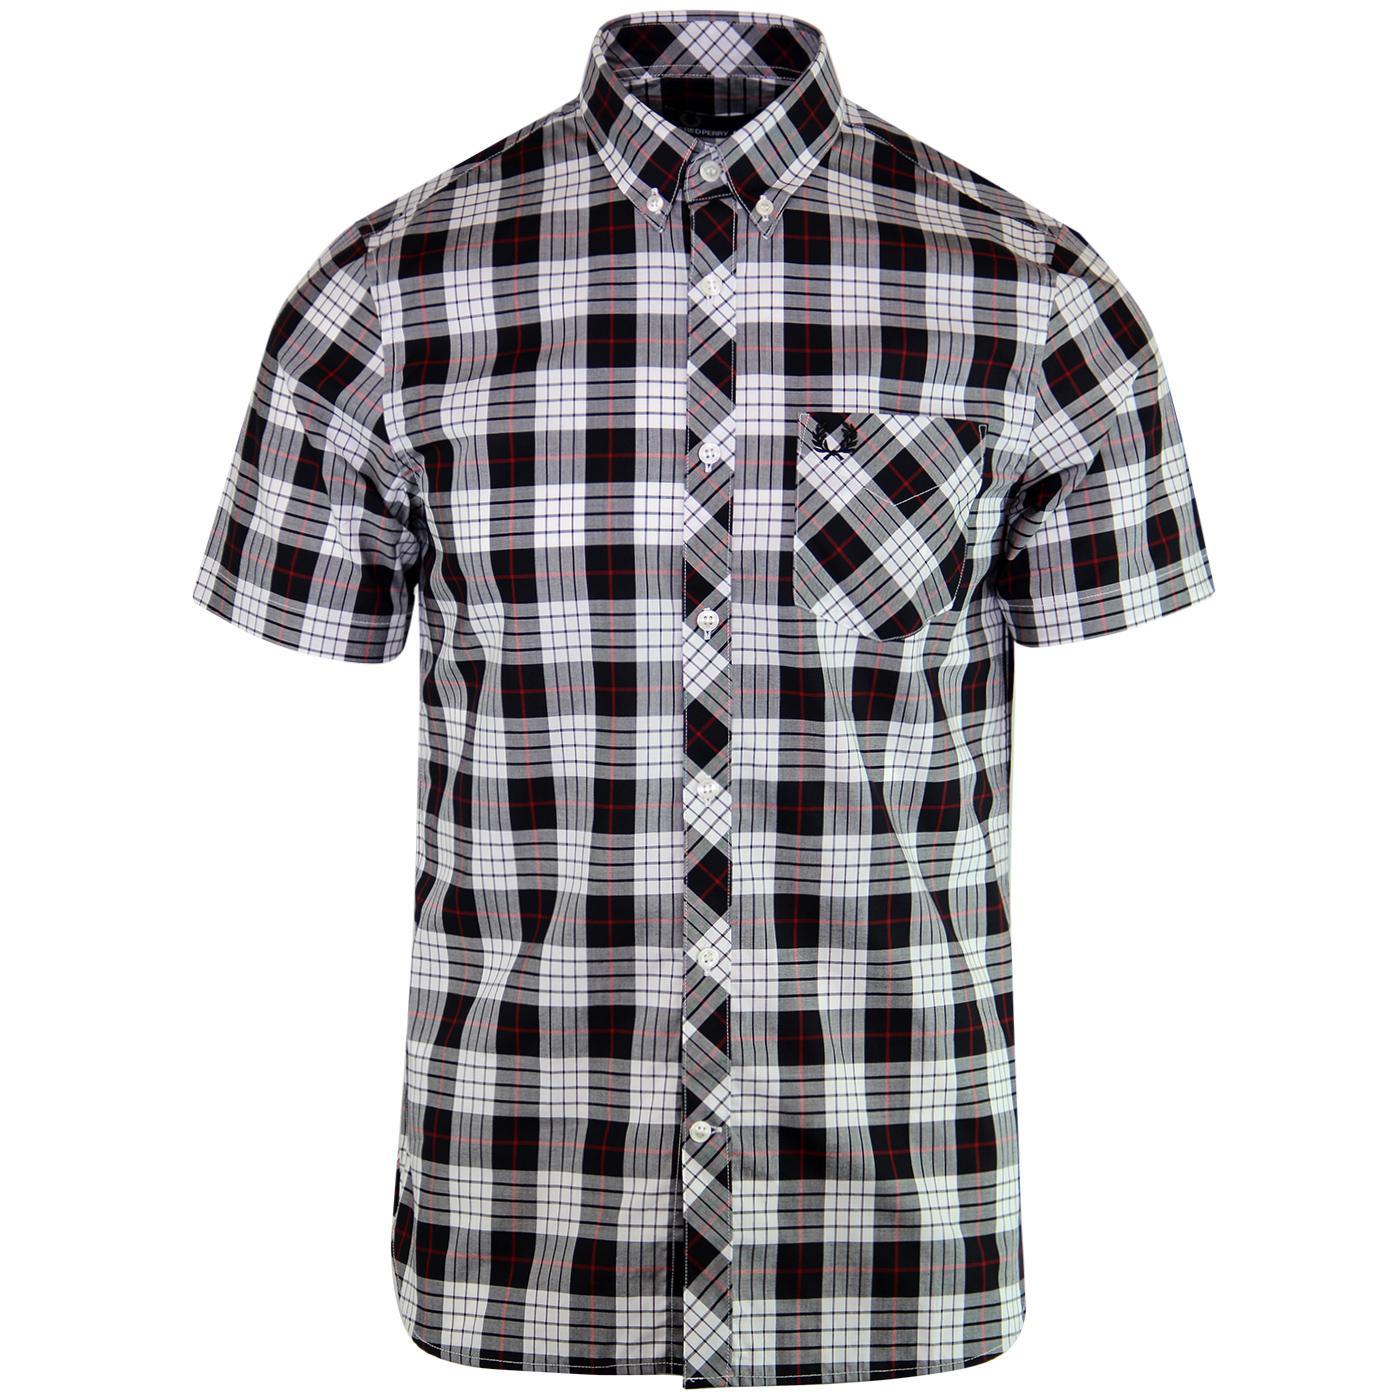 Tartan FRED PERRY Button Down Collar Mod Shirt B/W